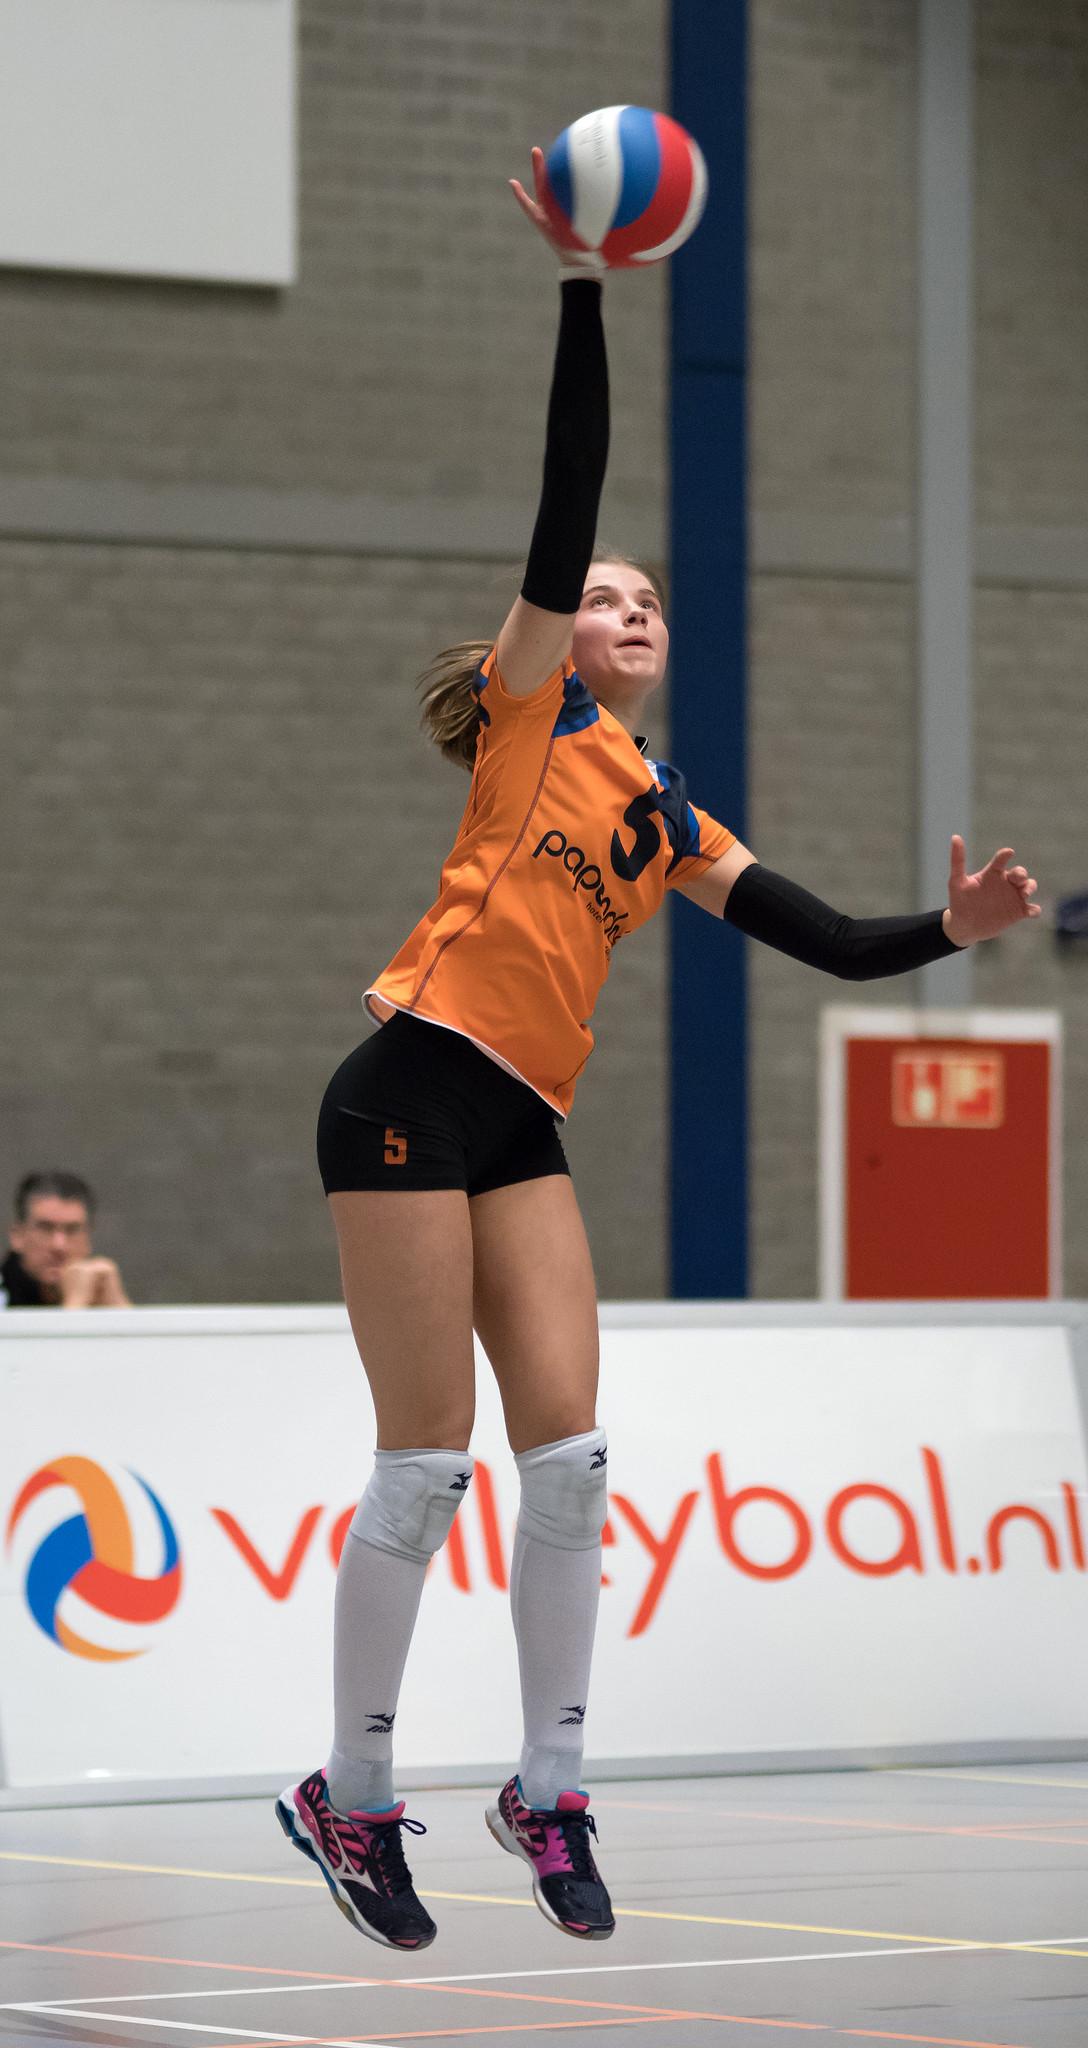 TT Papendal / Arnhem - Flynth FAST (3 - 0)